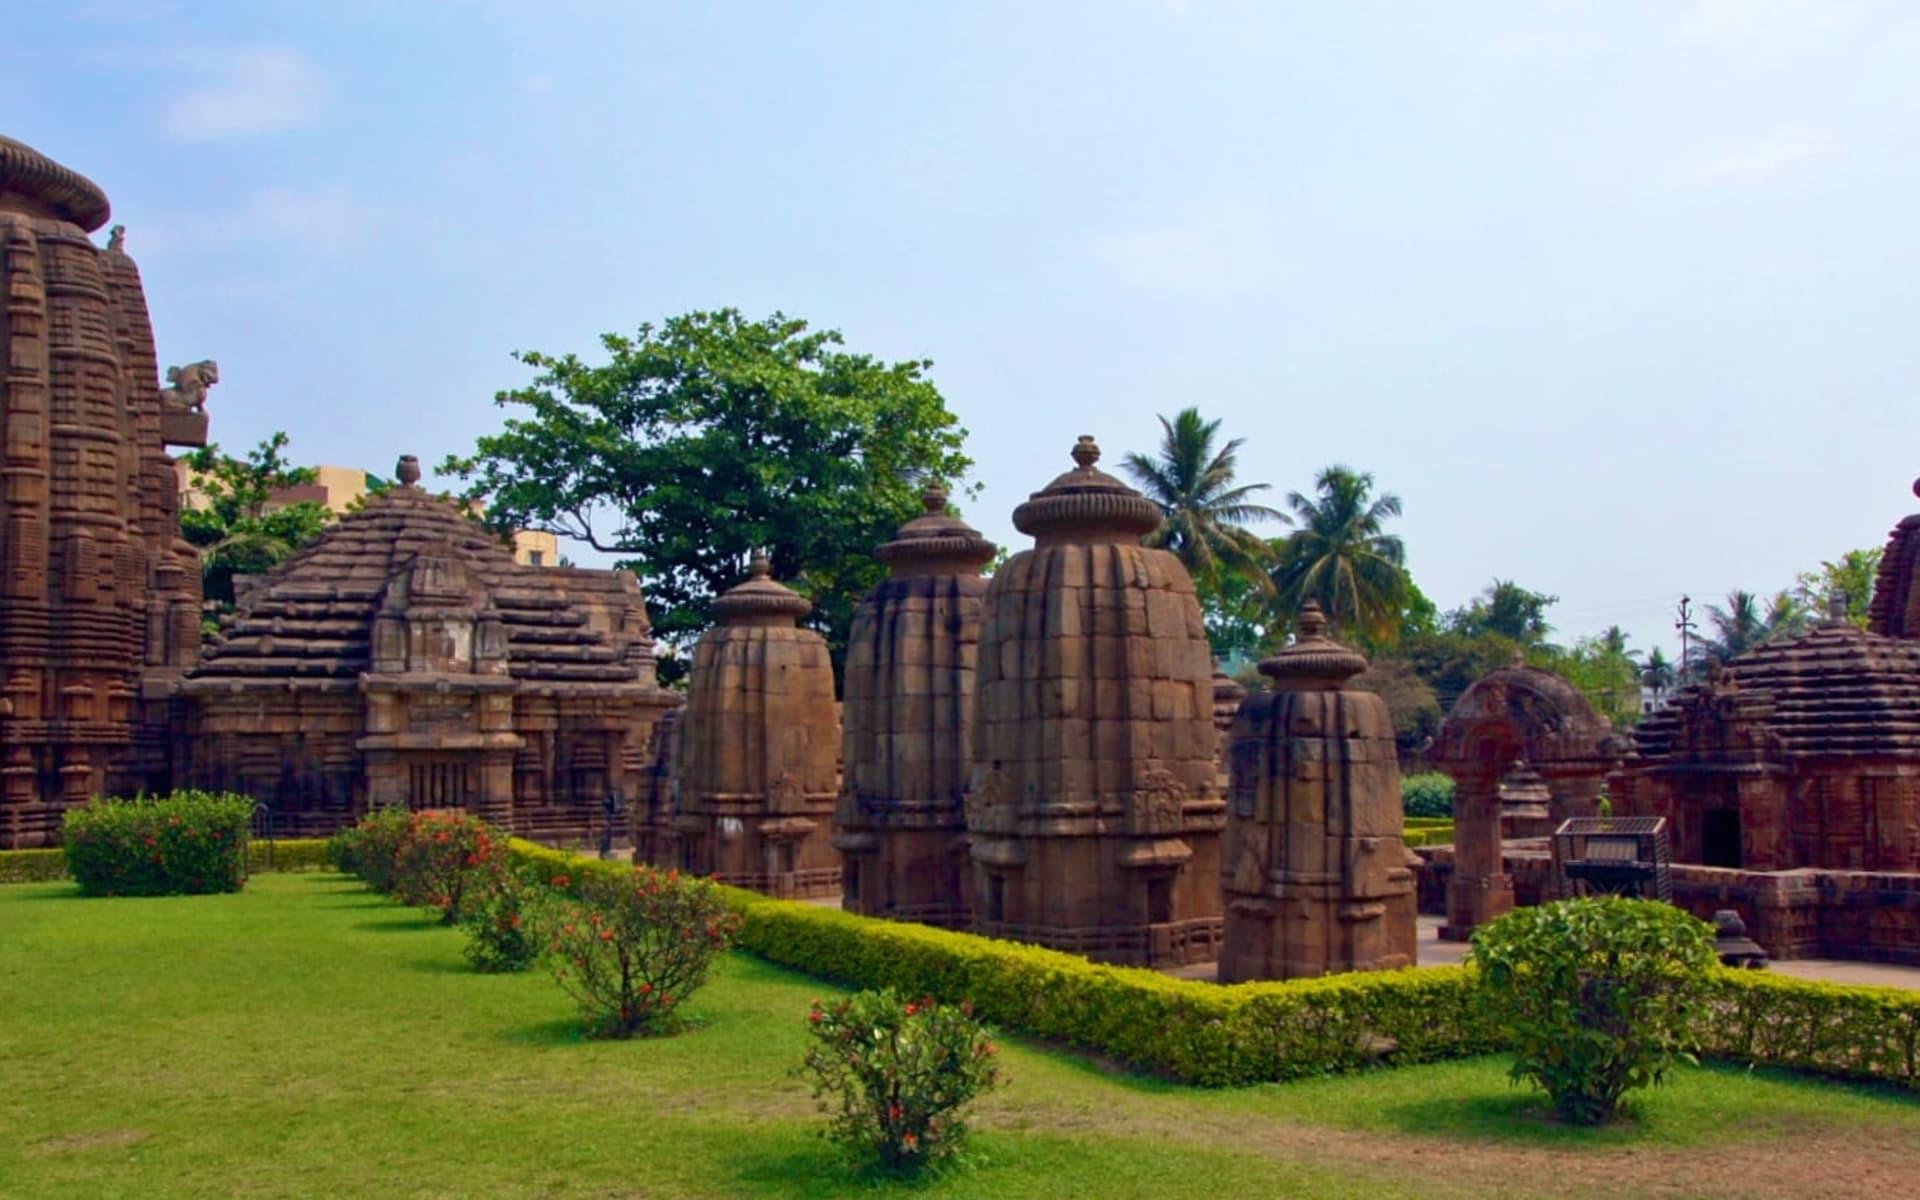 Die Tempel von Odisha ab Bhubaneswar: Temples Bhubaneswar